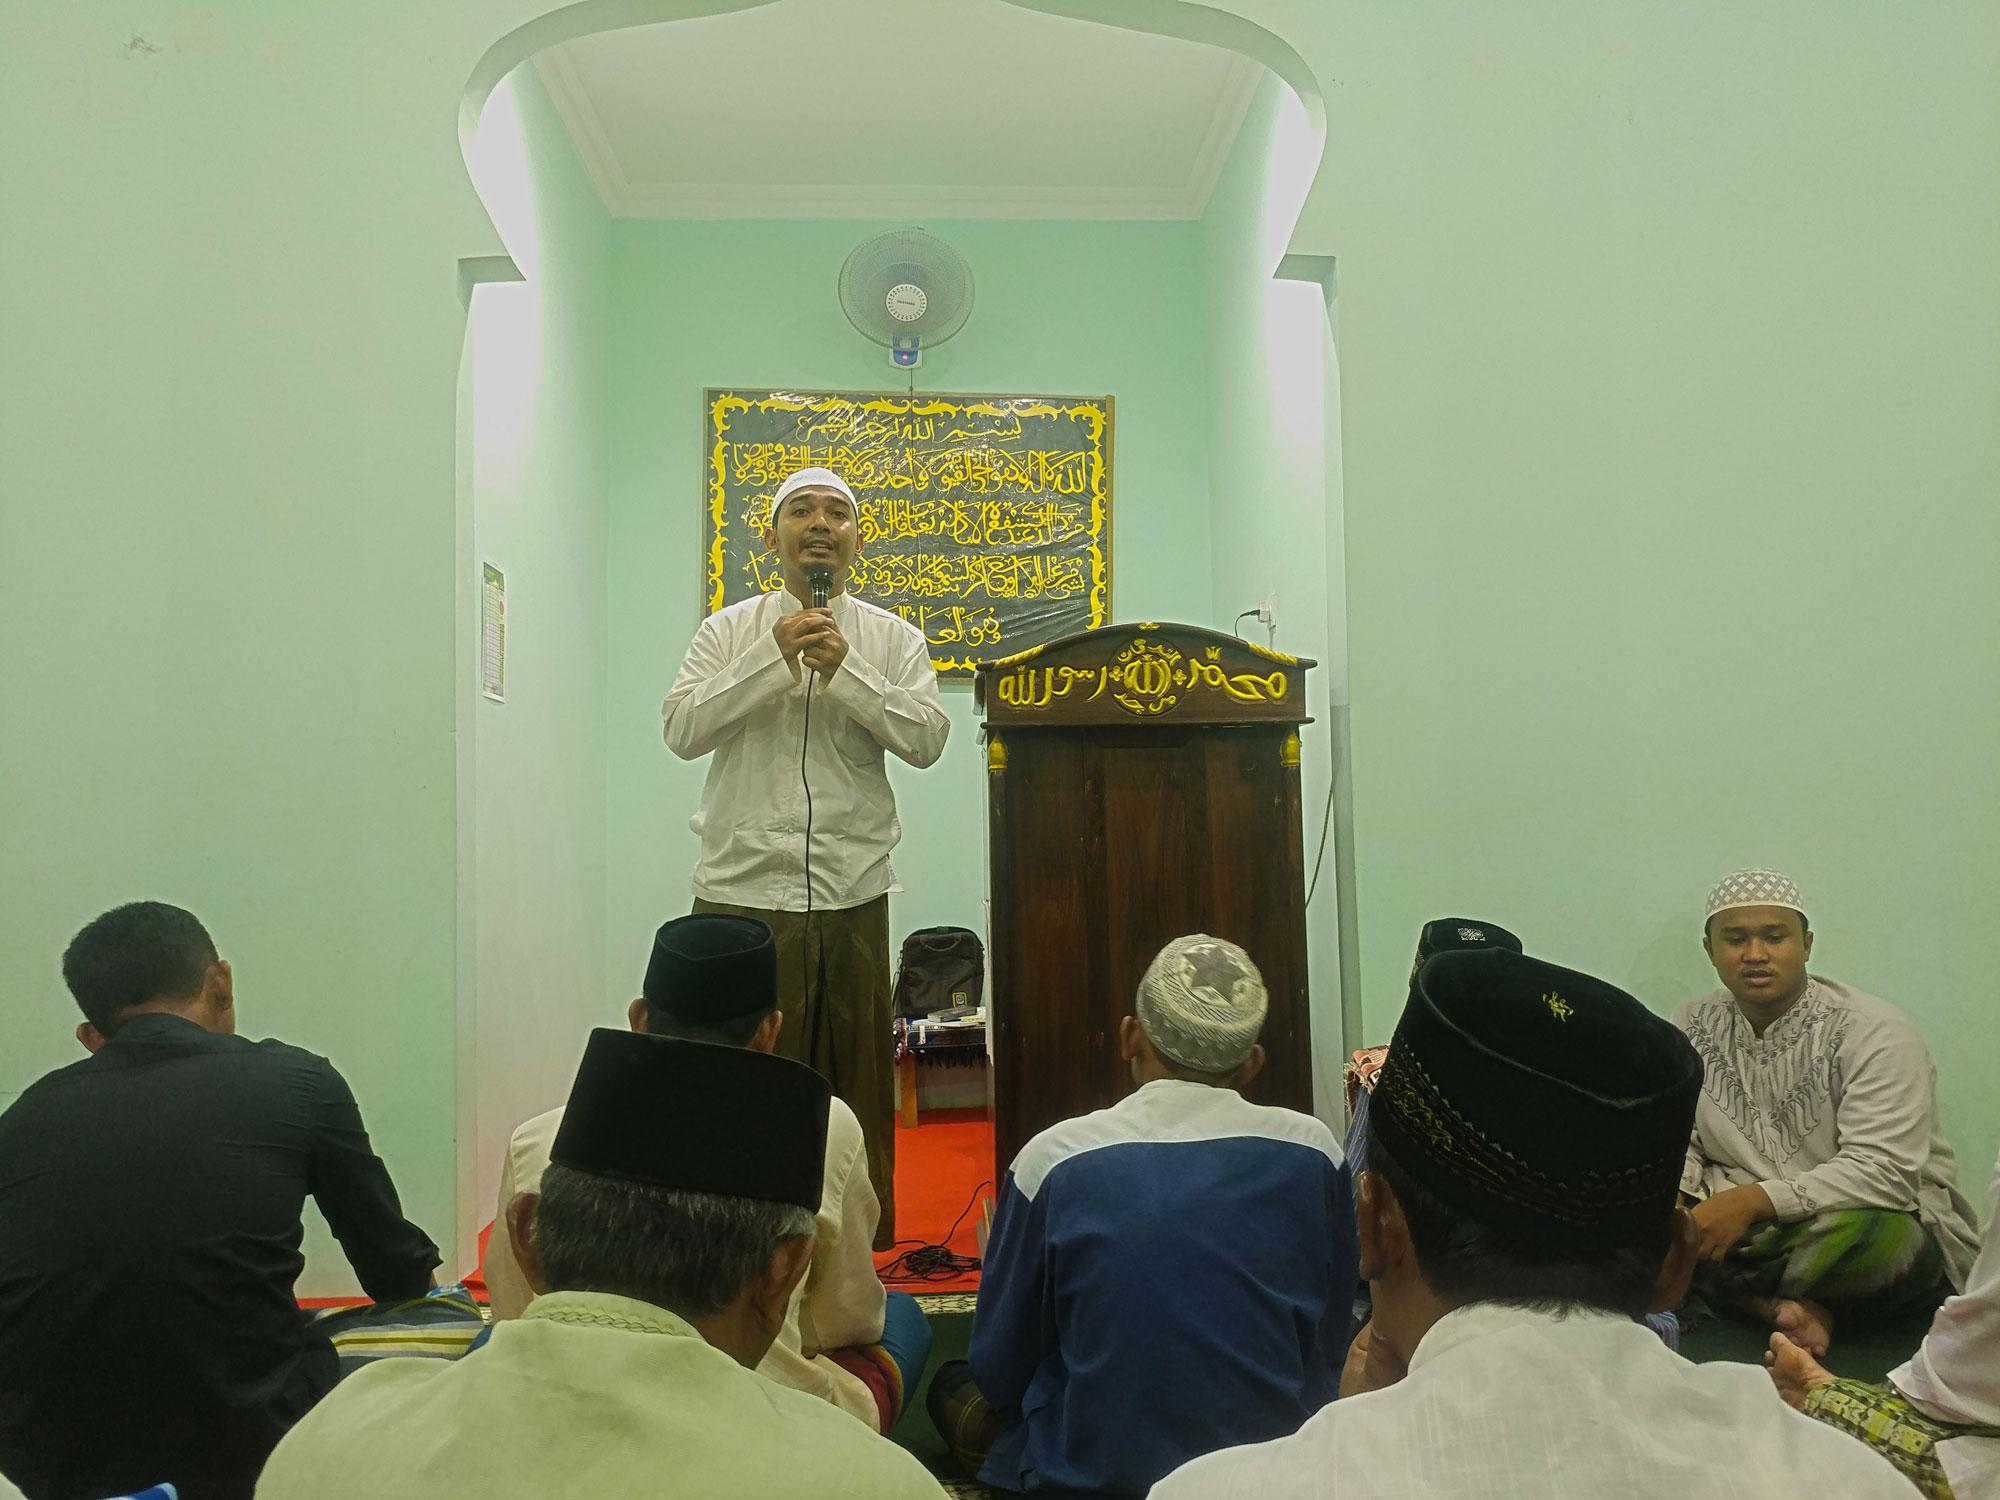 Pengajian Ramadhan bersama Ustadz Ali Assegaf di Masjid Al Furqon Pucung Kidul, Pucung, Eromoko,, Wonogiri, Malam ke-8 Ramadhan 1440 H 12 Mei 2019.